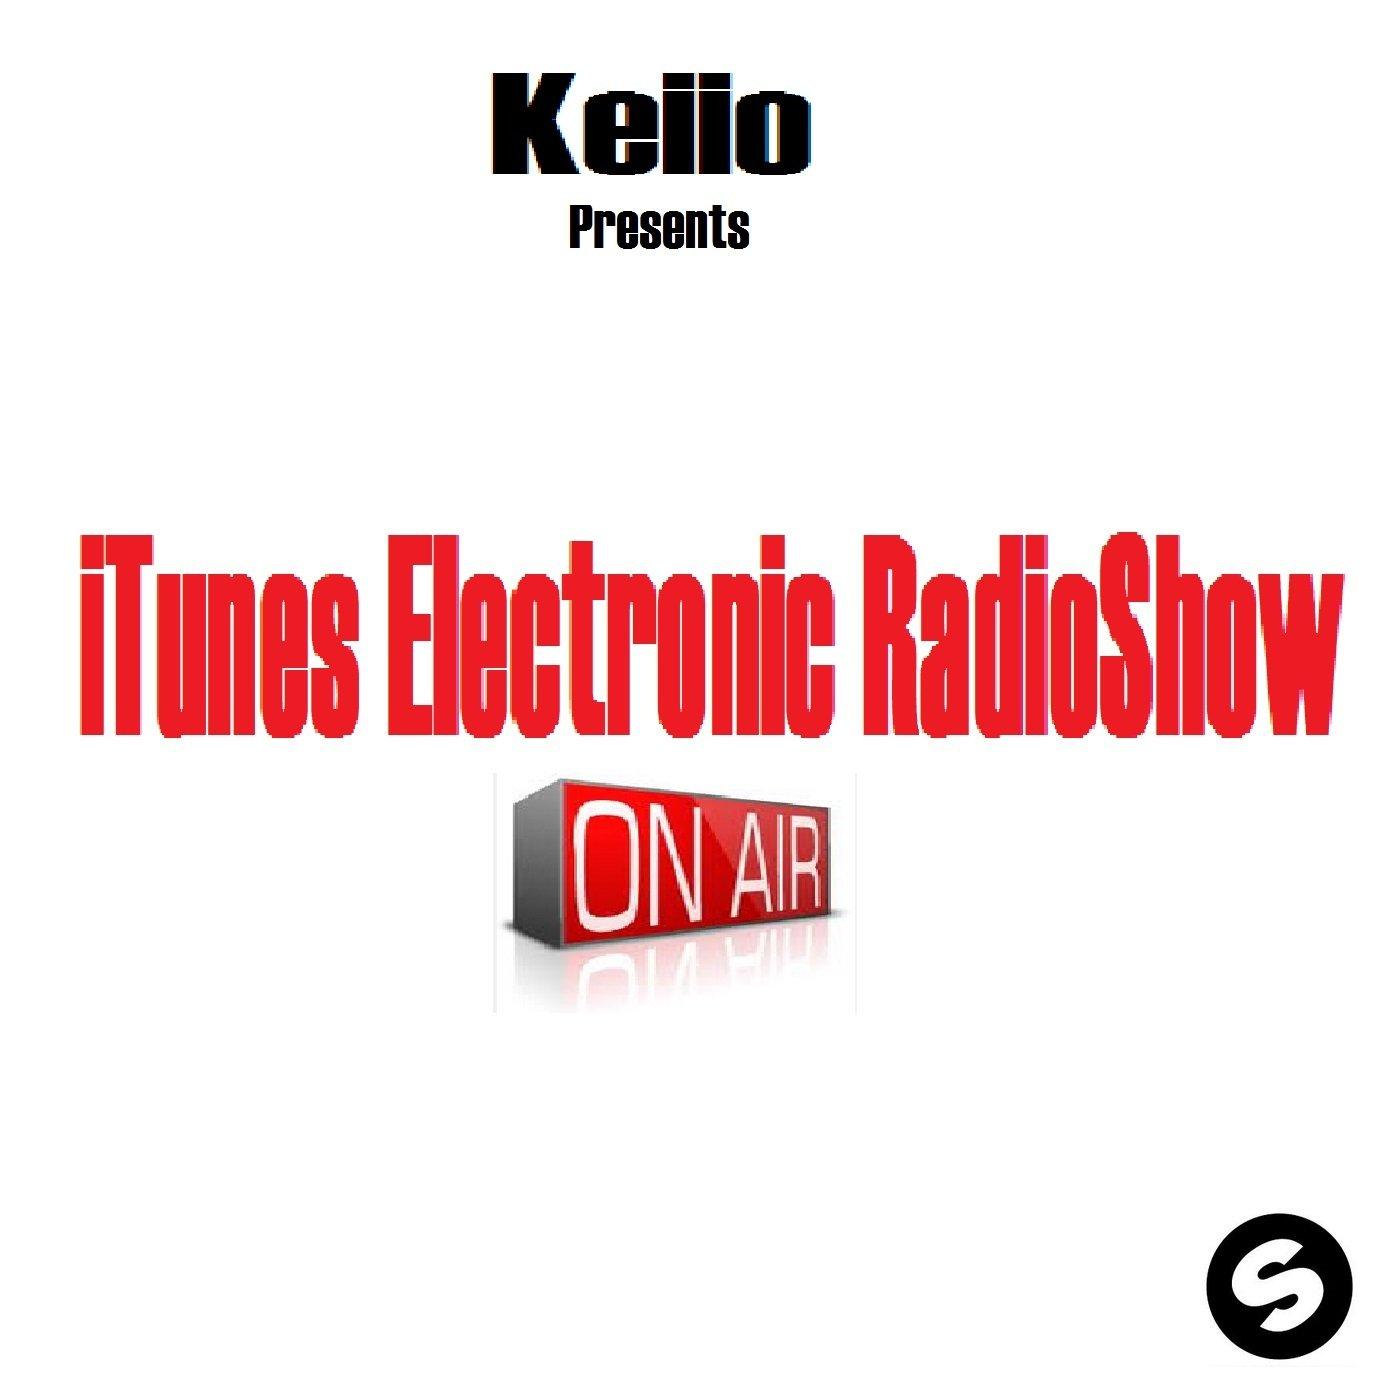 <![CDATA[iTunes Electronic Radioshow by Keiio]]>